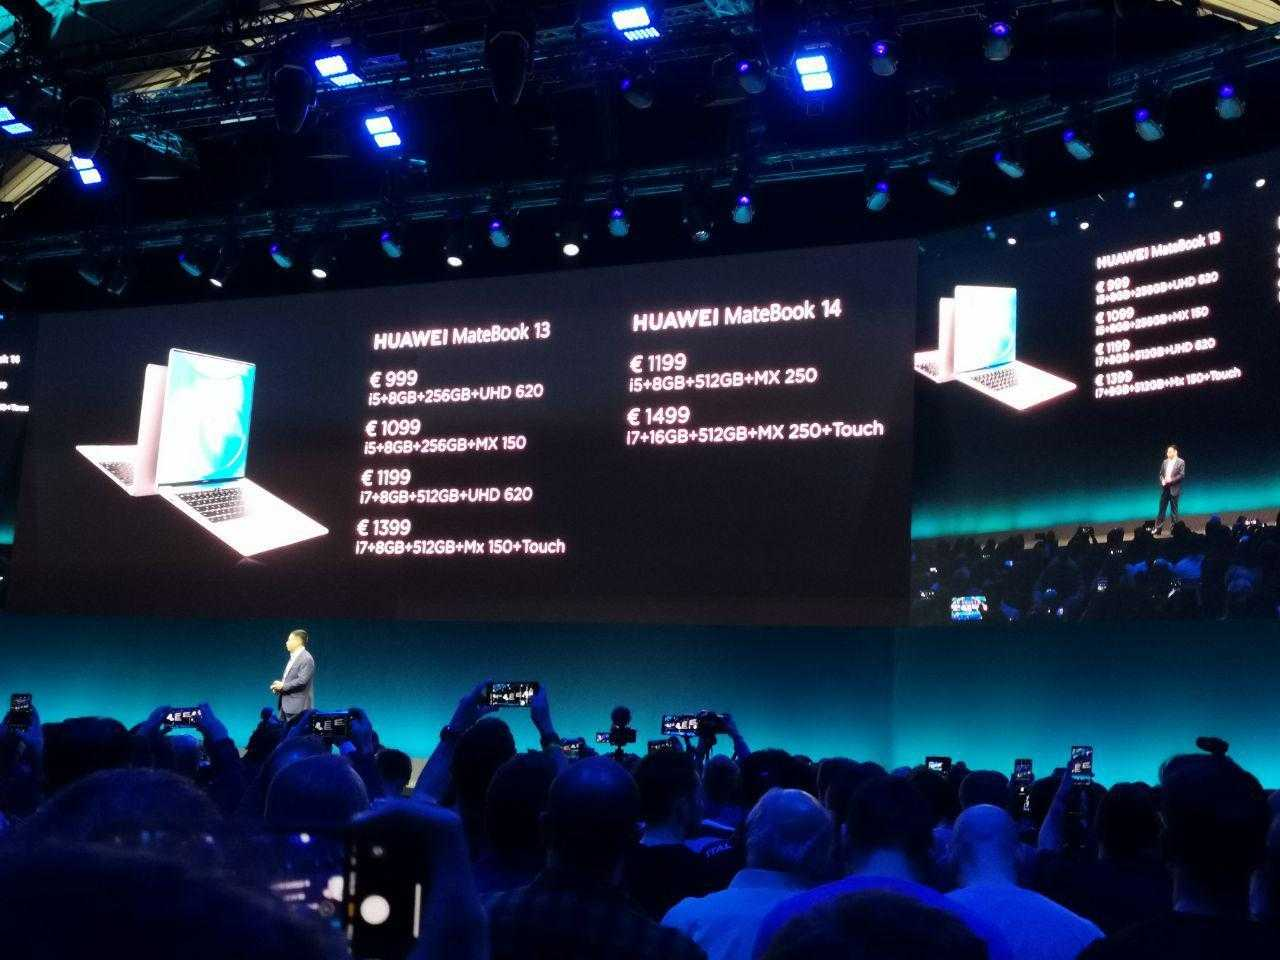 MWC 2019. Huawei представила недорогой MateBook 14 (photo 2019 02 24 16 57 49 2)